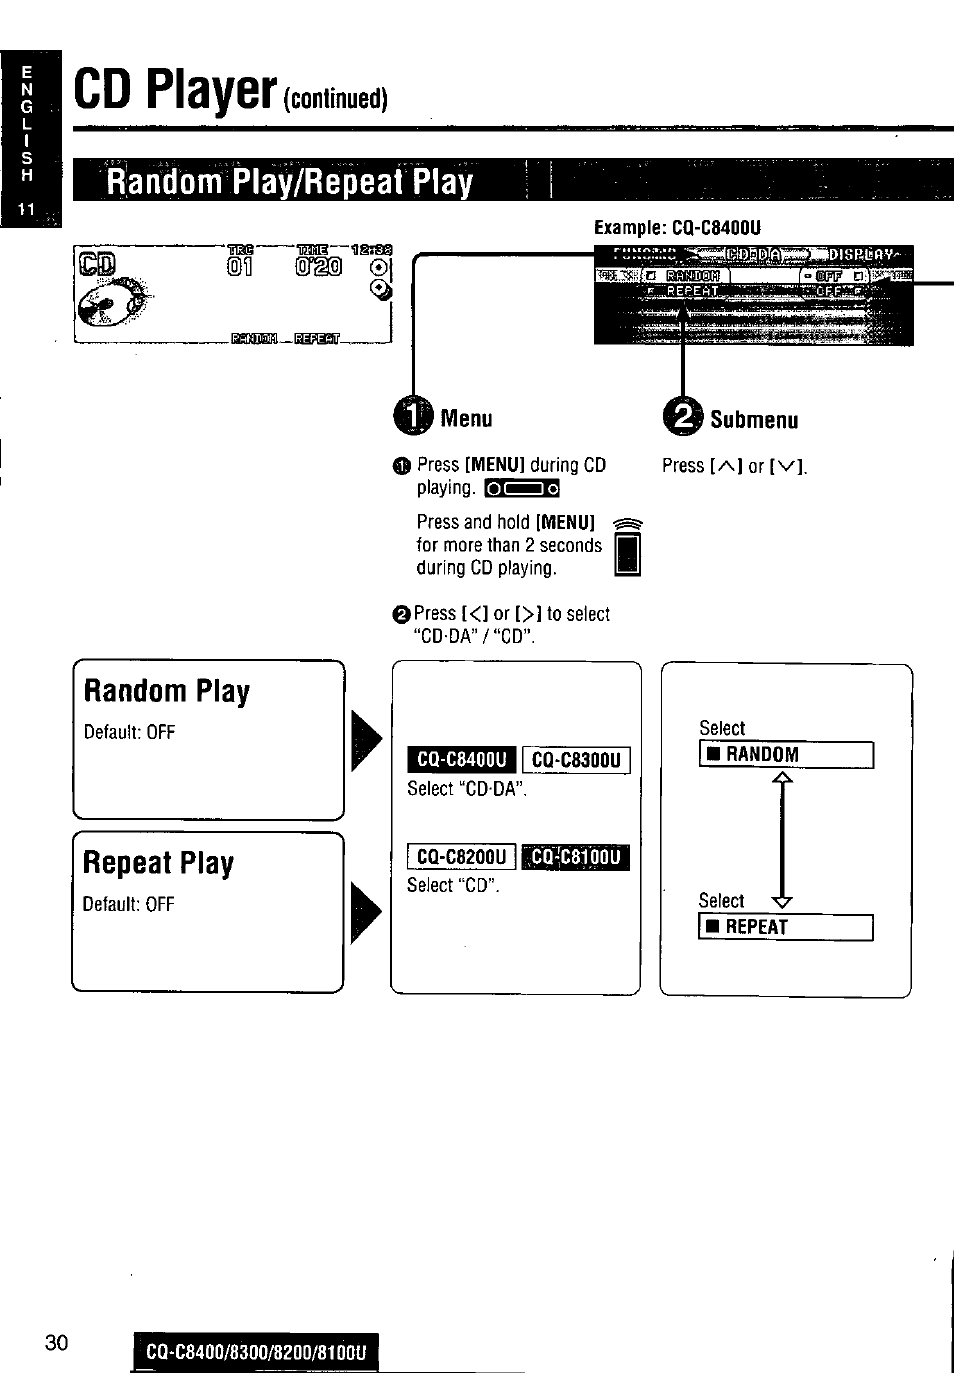 Panasonic Cq C8400u Wiring Diagram Manual Of Bal3000 Em Ballast Cd Player Continued Rlaifdom Play Repeat Rh Manualsdir Com